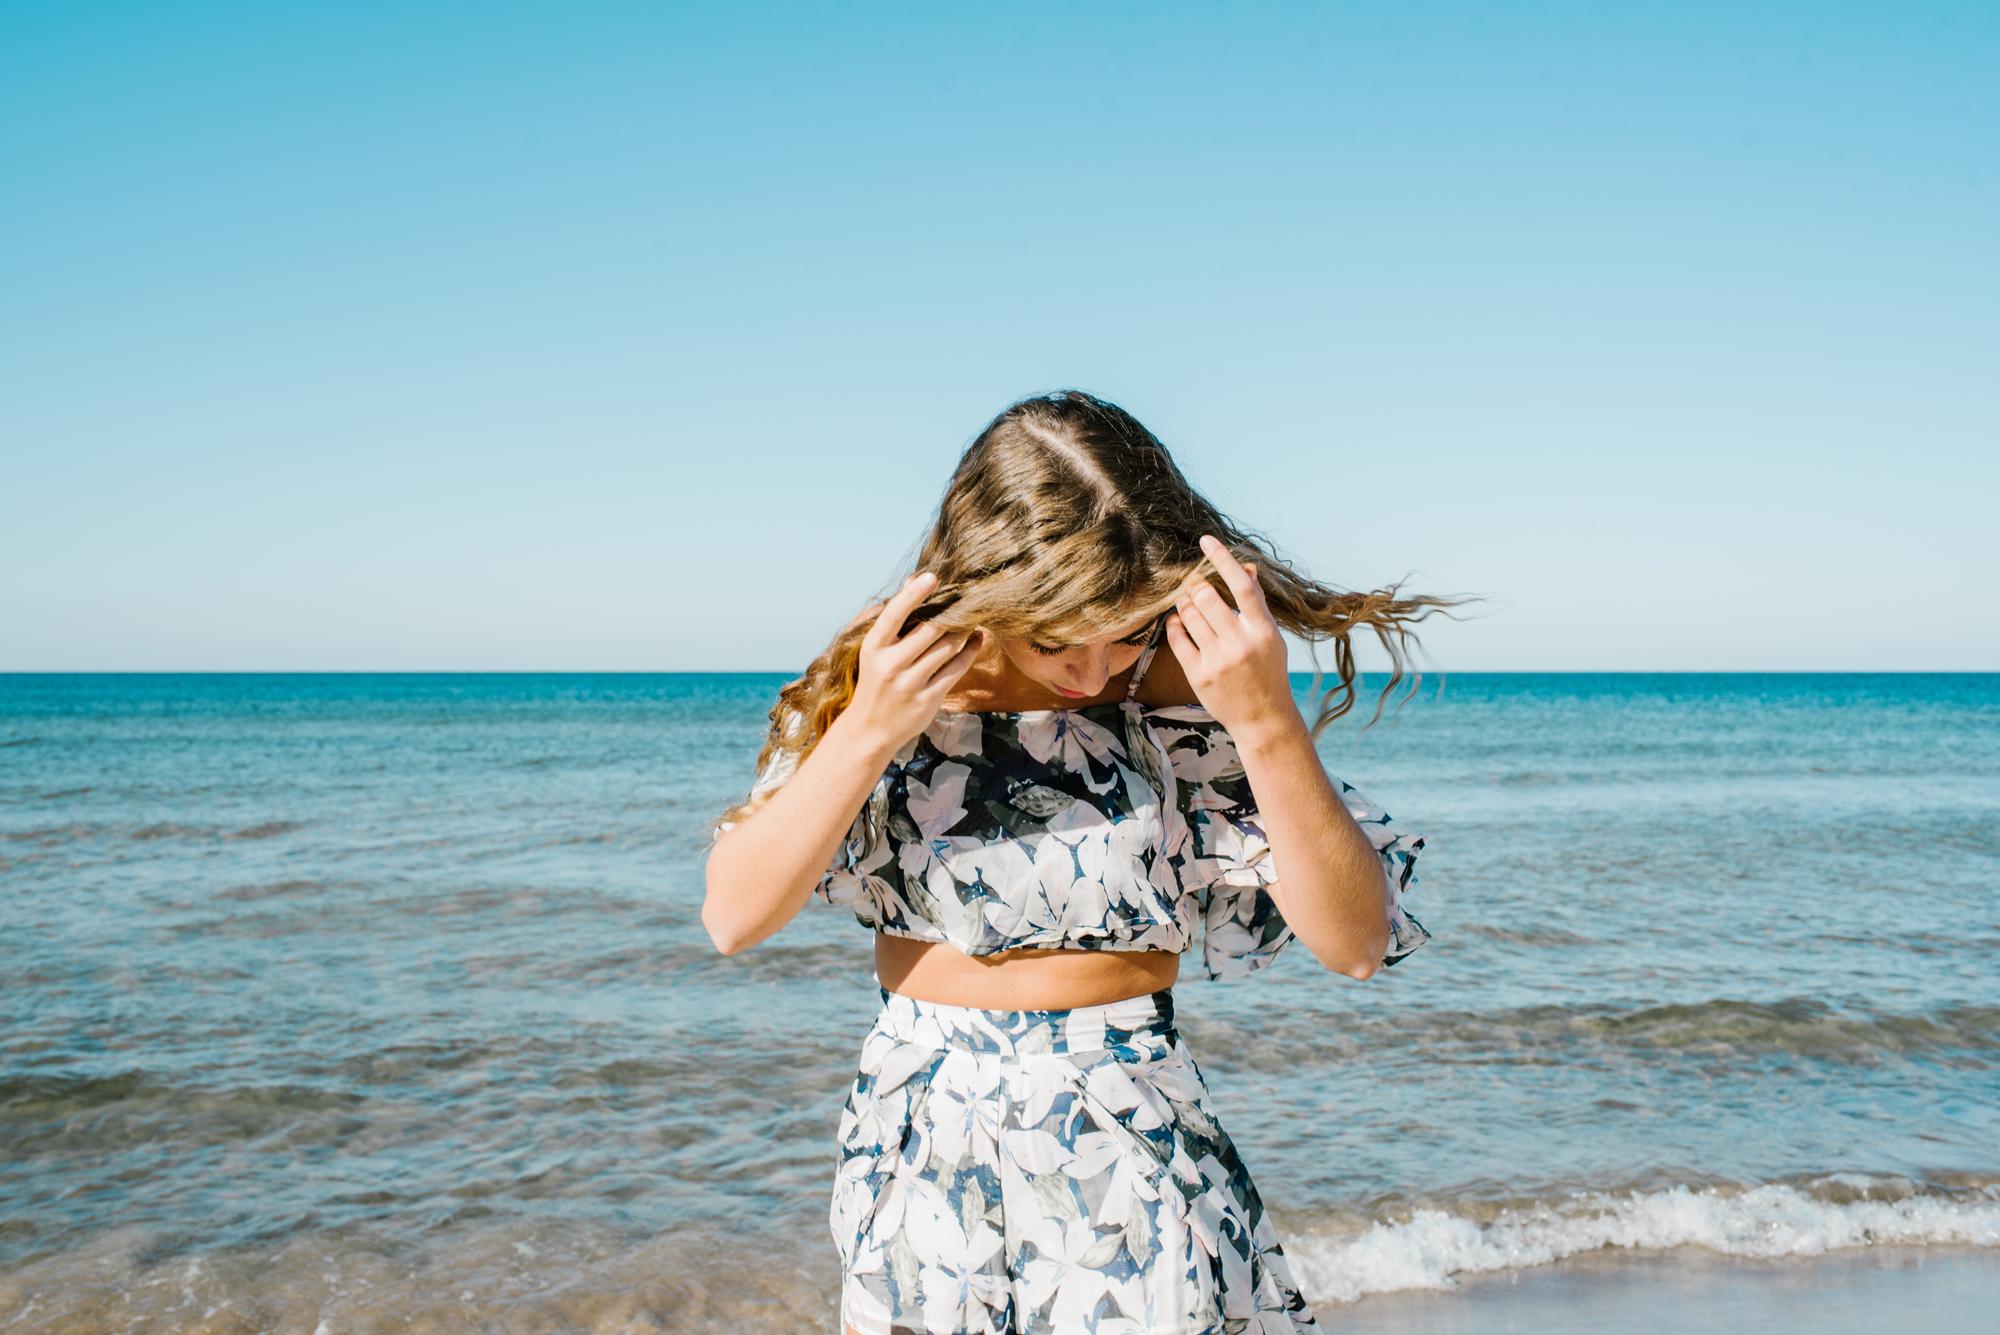 Grand-Haven-Michigan-Beach-Downtown-Senior-High-School-Photographer-Sydney-Marie (20).jpg